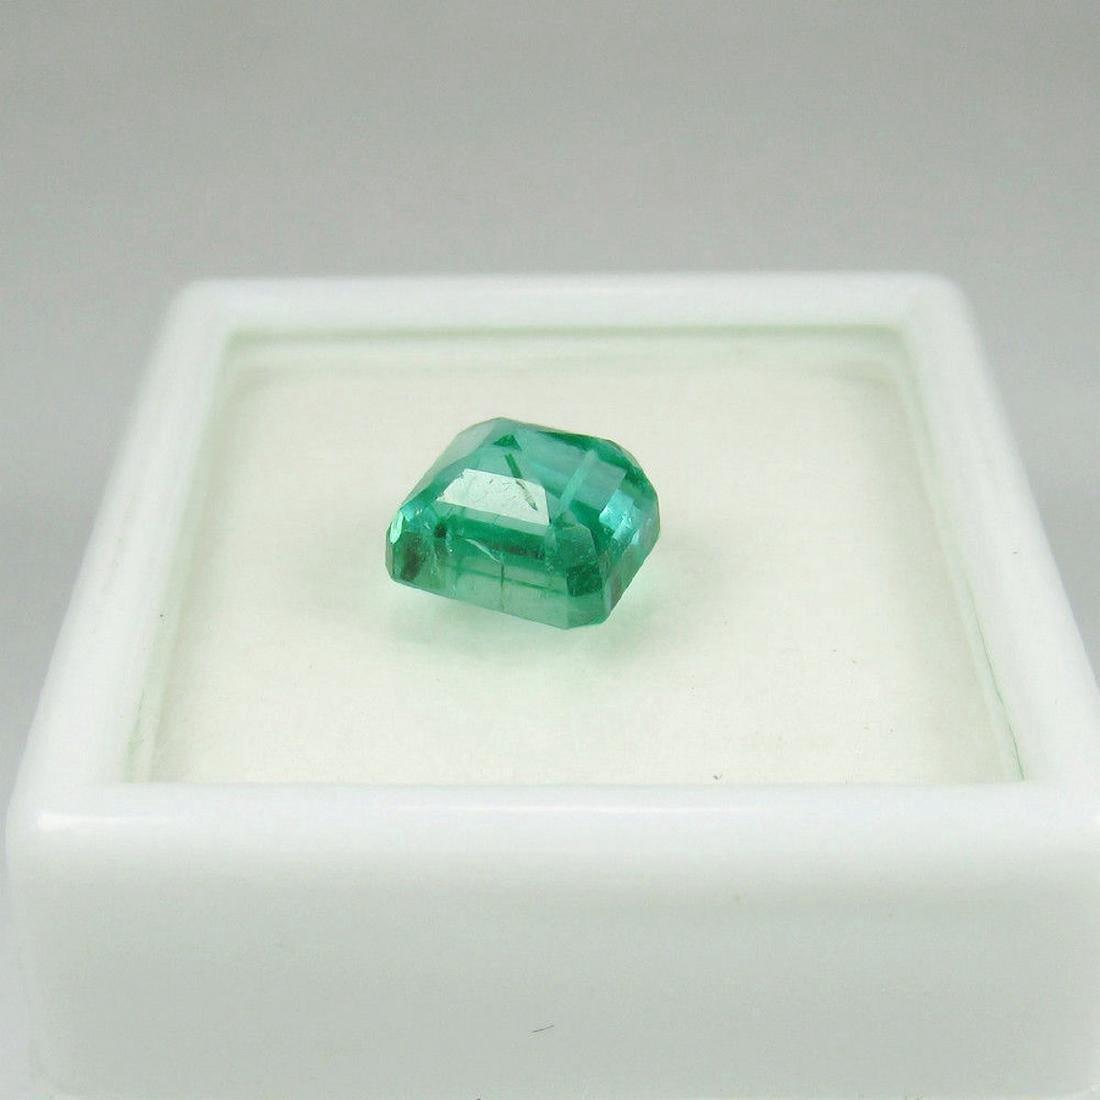 1.77 Carat Loose Zambian Emerald Octagon Stone - 2